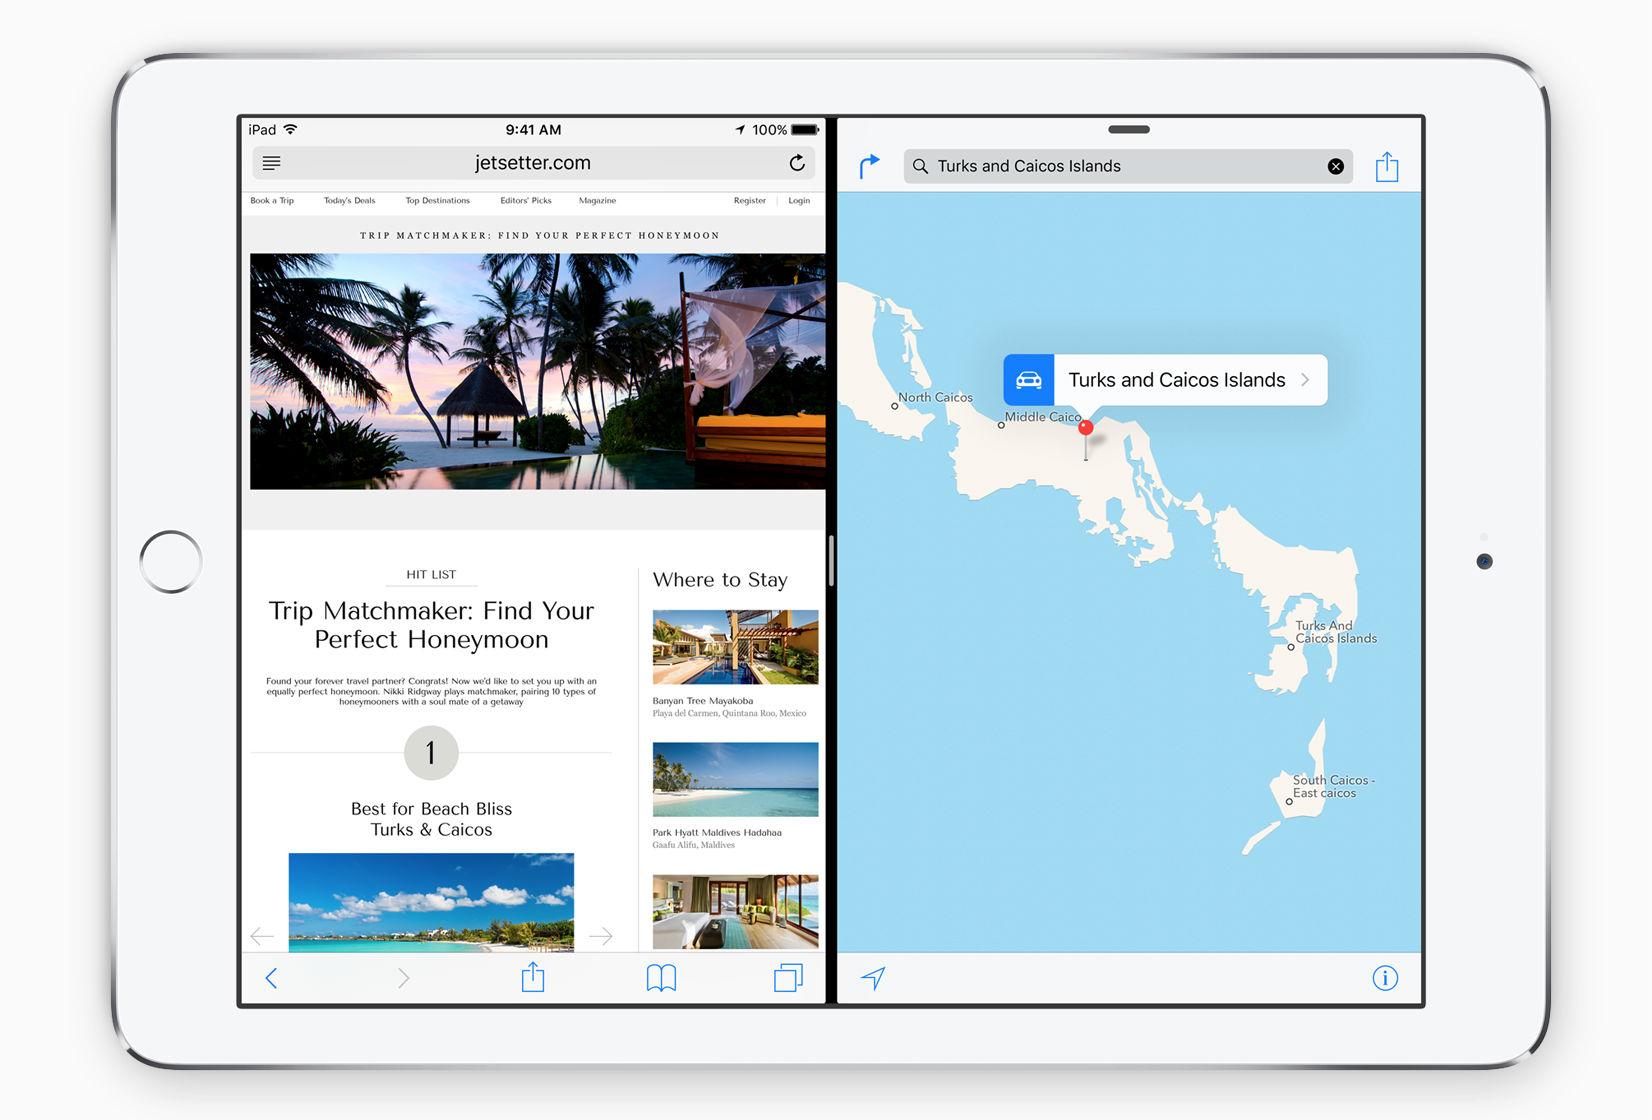 iPad multitasking split-screen iOS 9